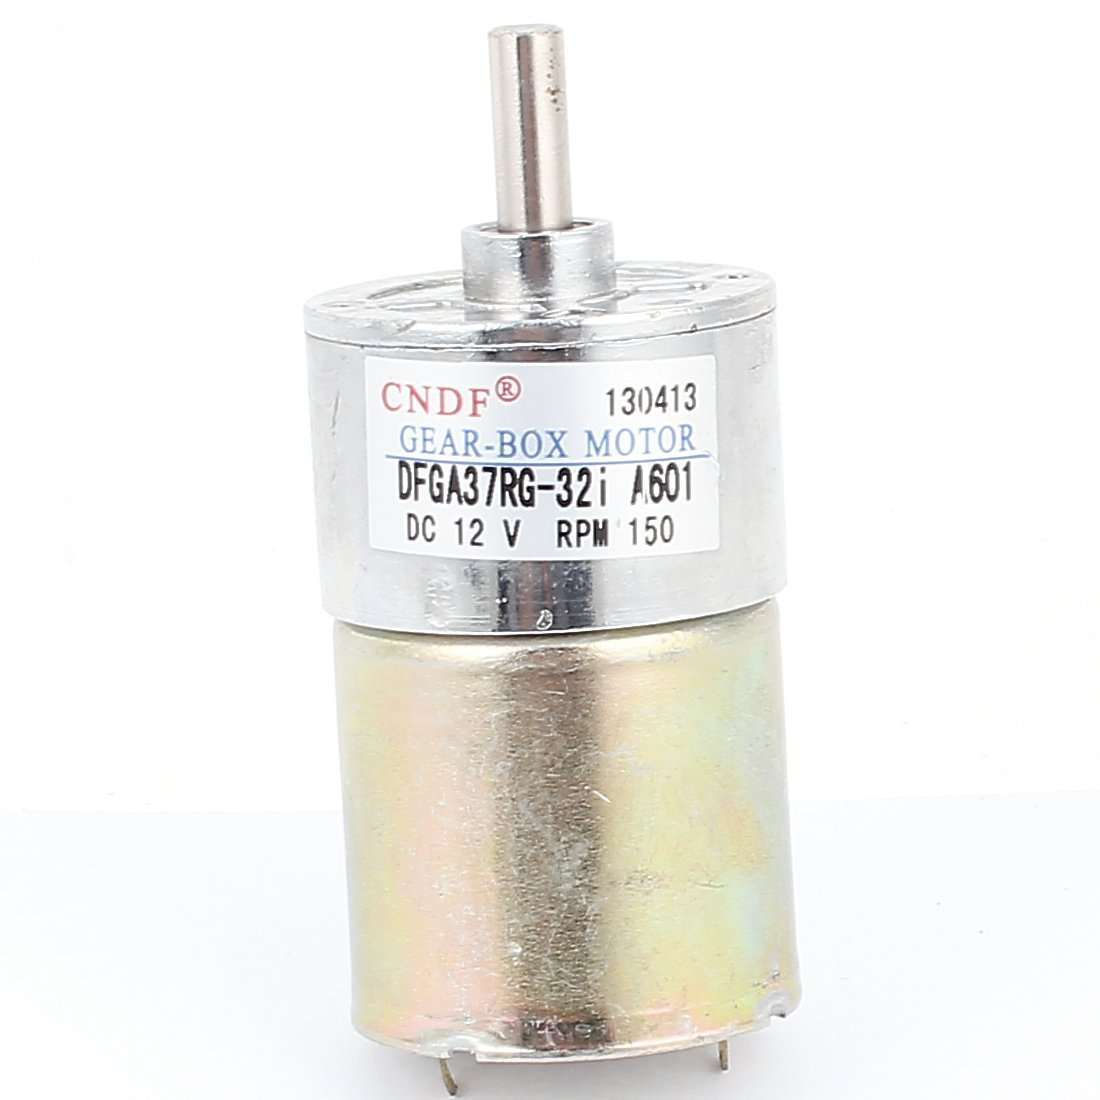 EbuyChX DFGA37-a601 DC 12V 150 RPM 6mm baras High Torque Gear-Box Electric Motor - - Amazon.com